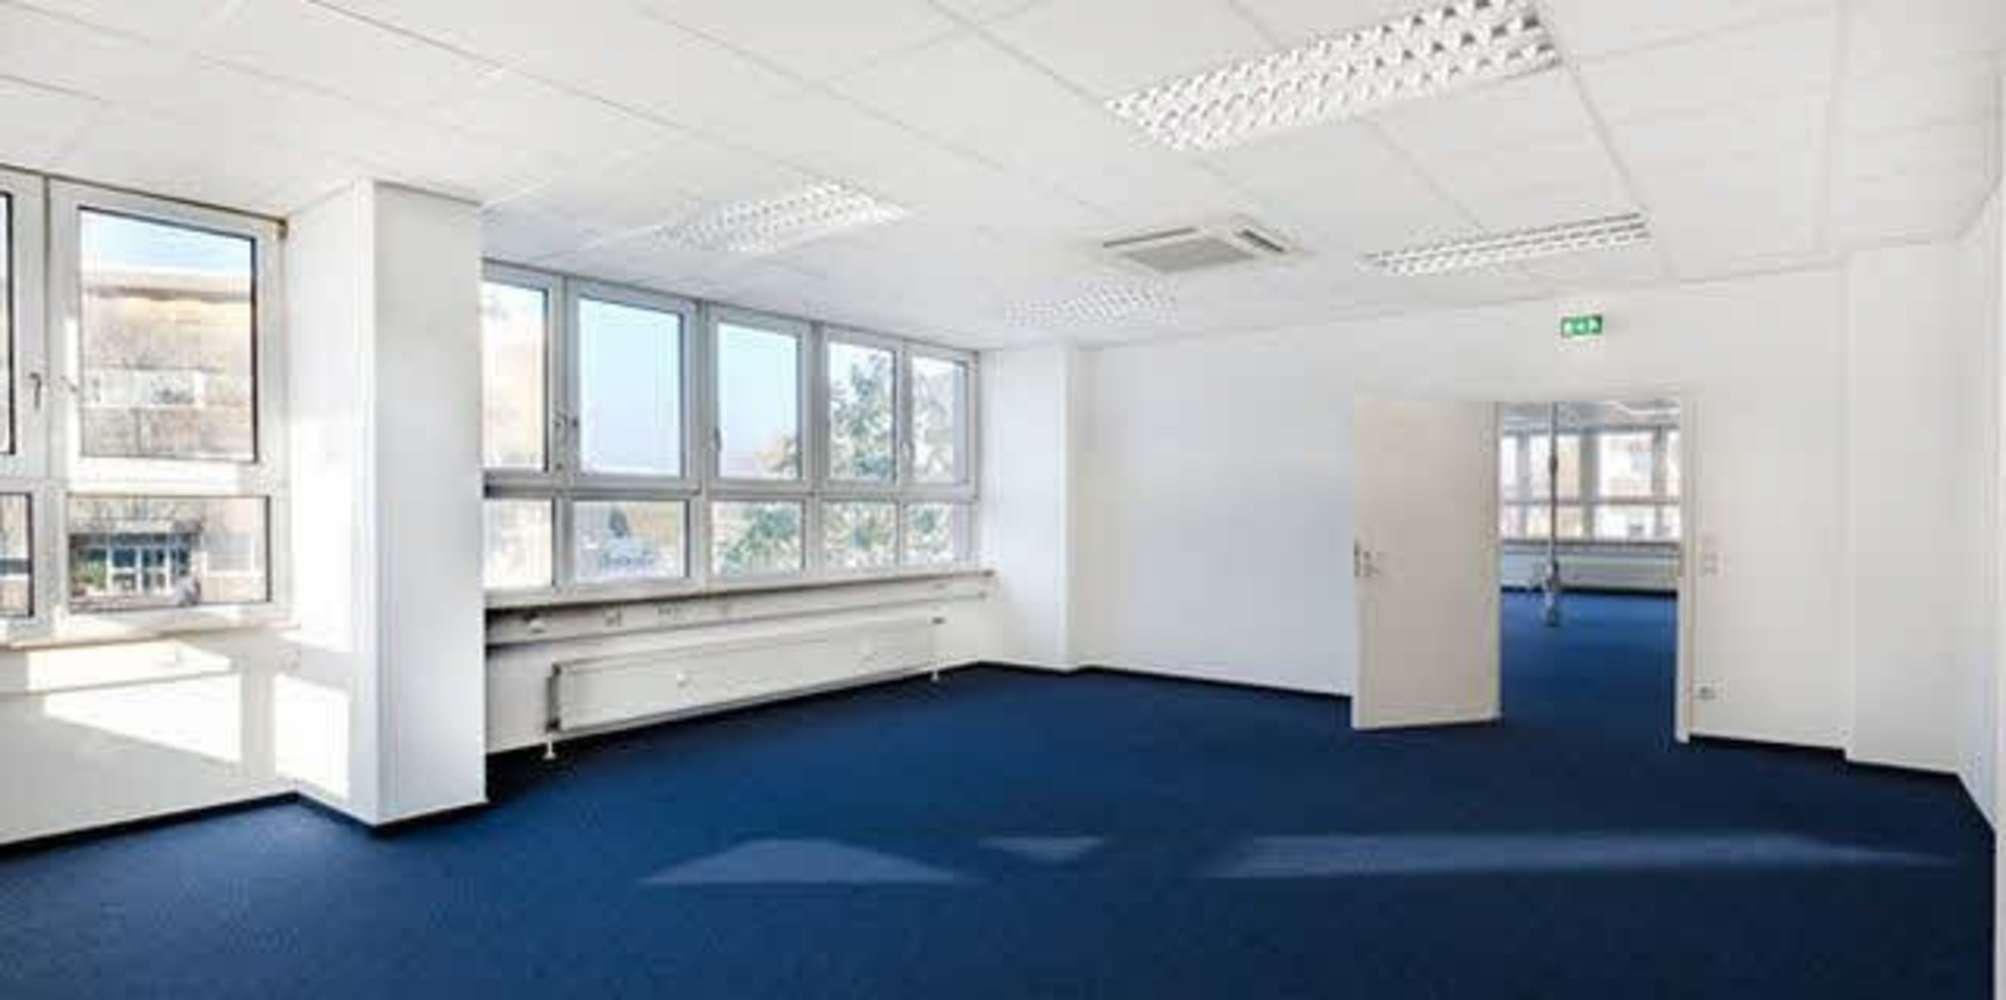 Büros Frankfurt am main, 60437 - Büro - Frankfurt am Main, Nieder-Eschbach - F2400 - 9534696